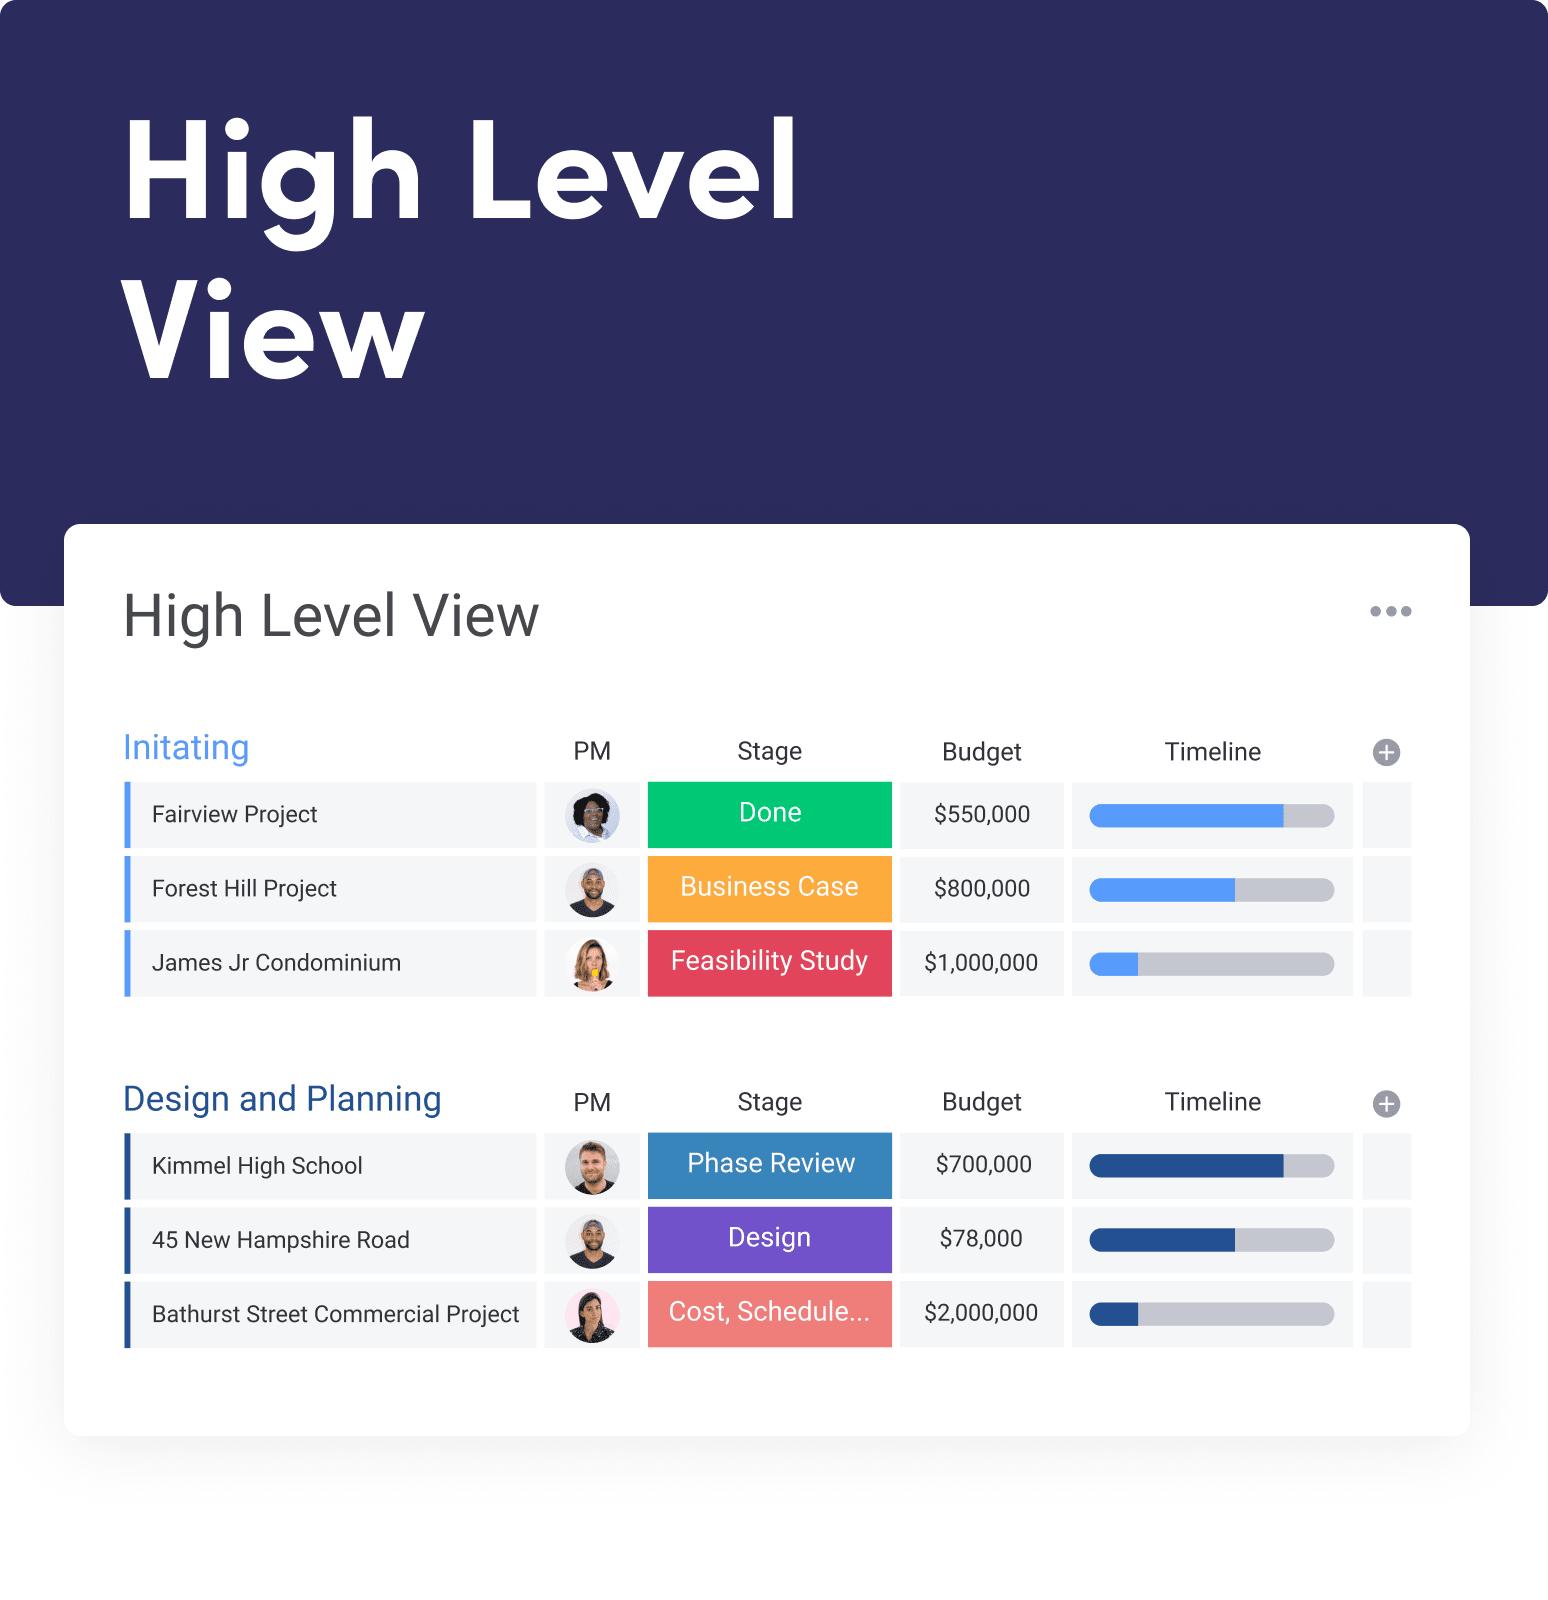 HighLevelView